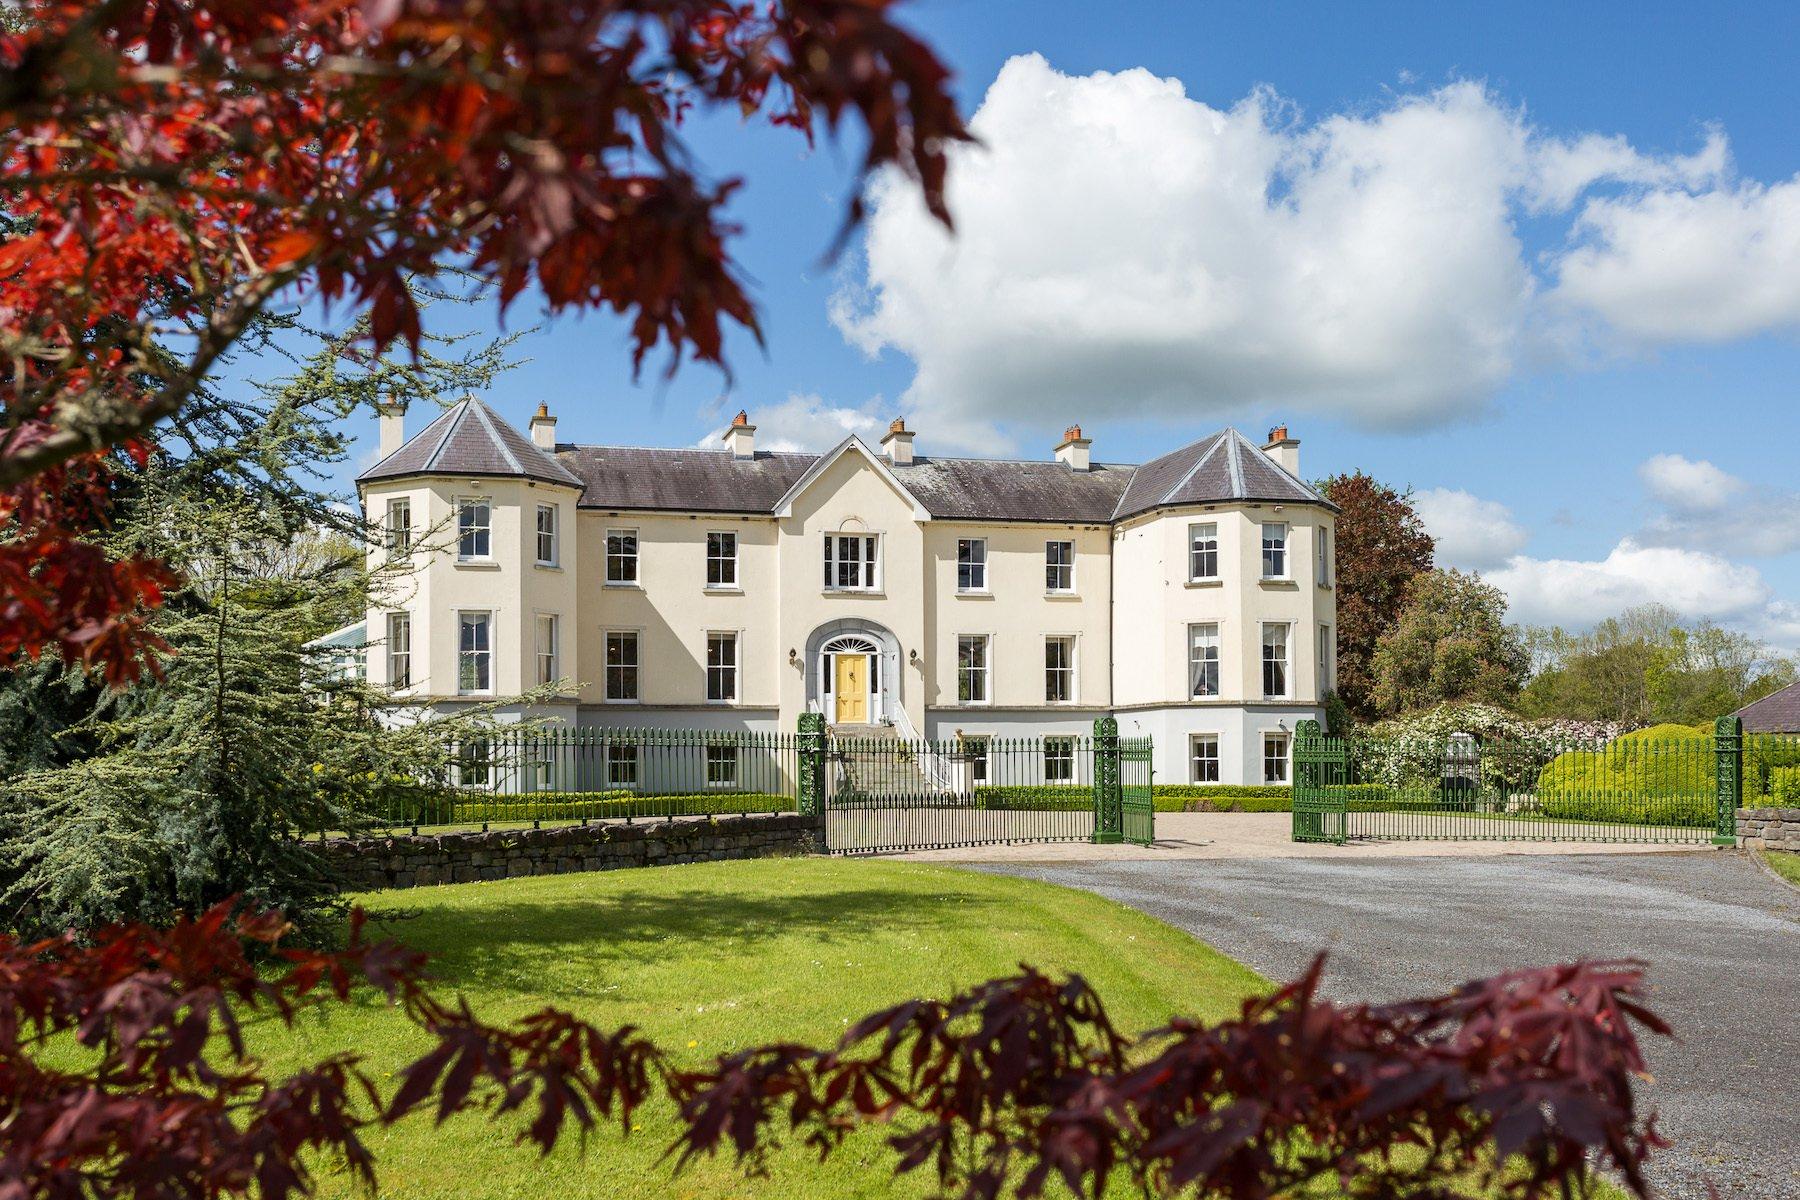 County Galway, Ireland 1 - 10528997